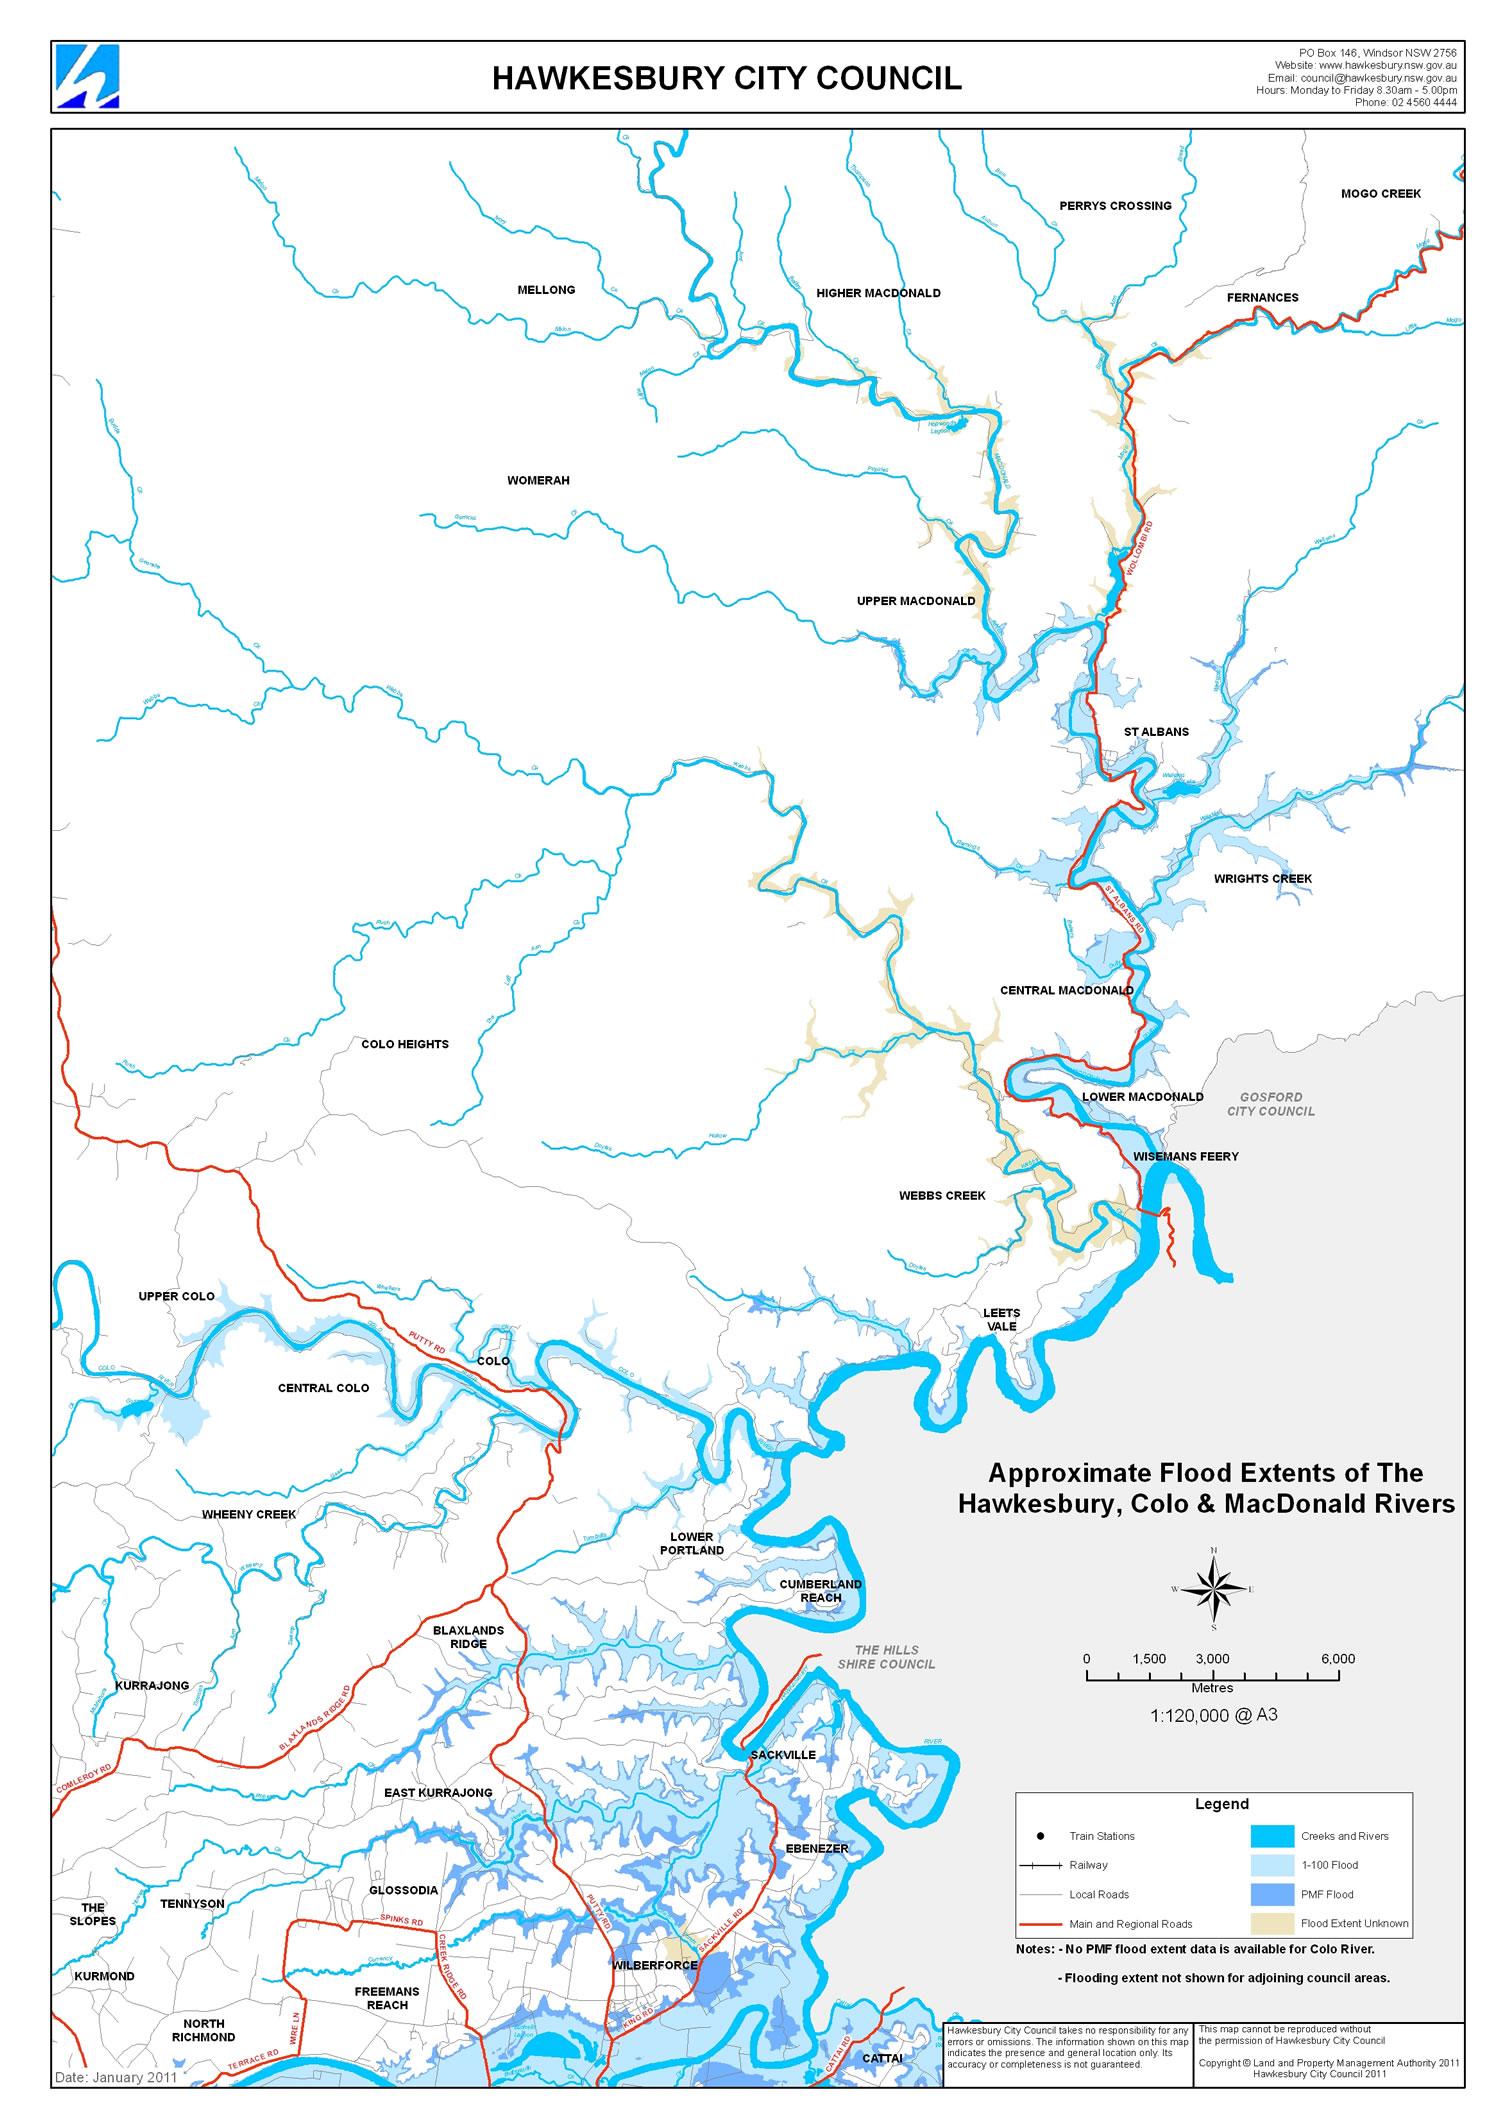 Flood Extent Maps